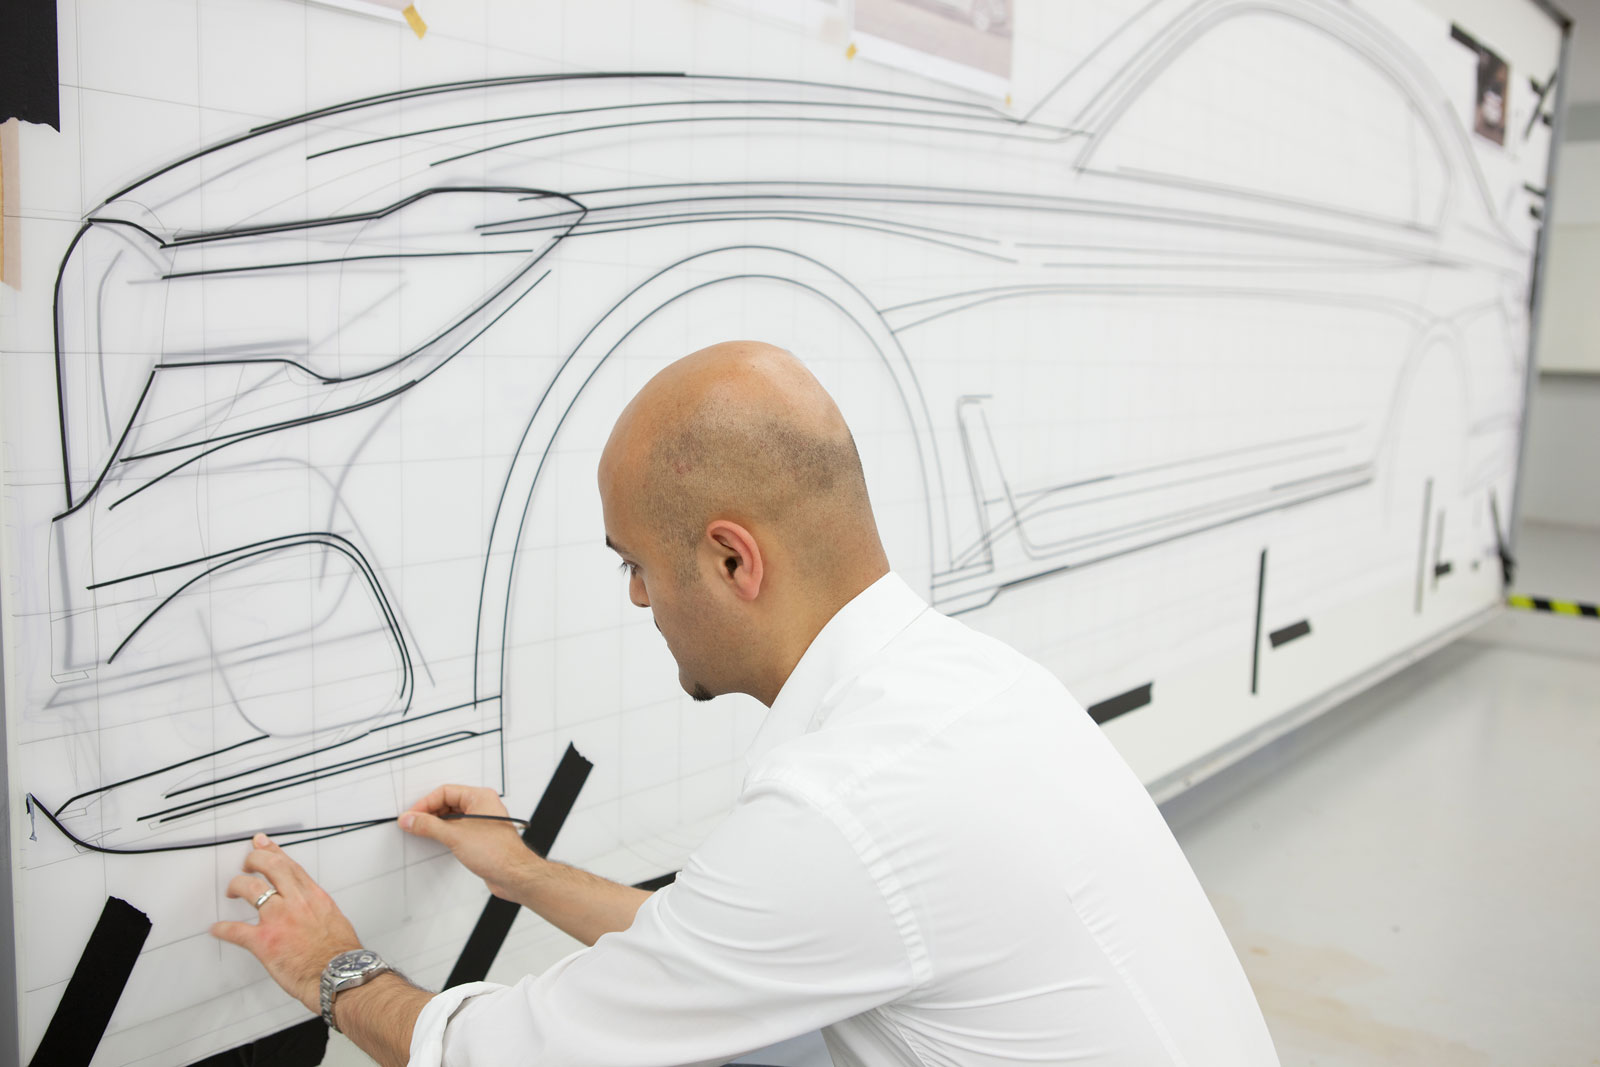 Drawn bmw car design BMW Fullsize Drawing  Process